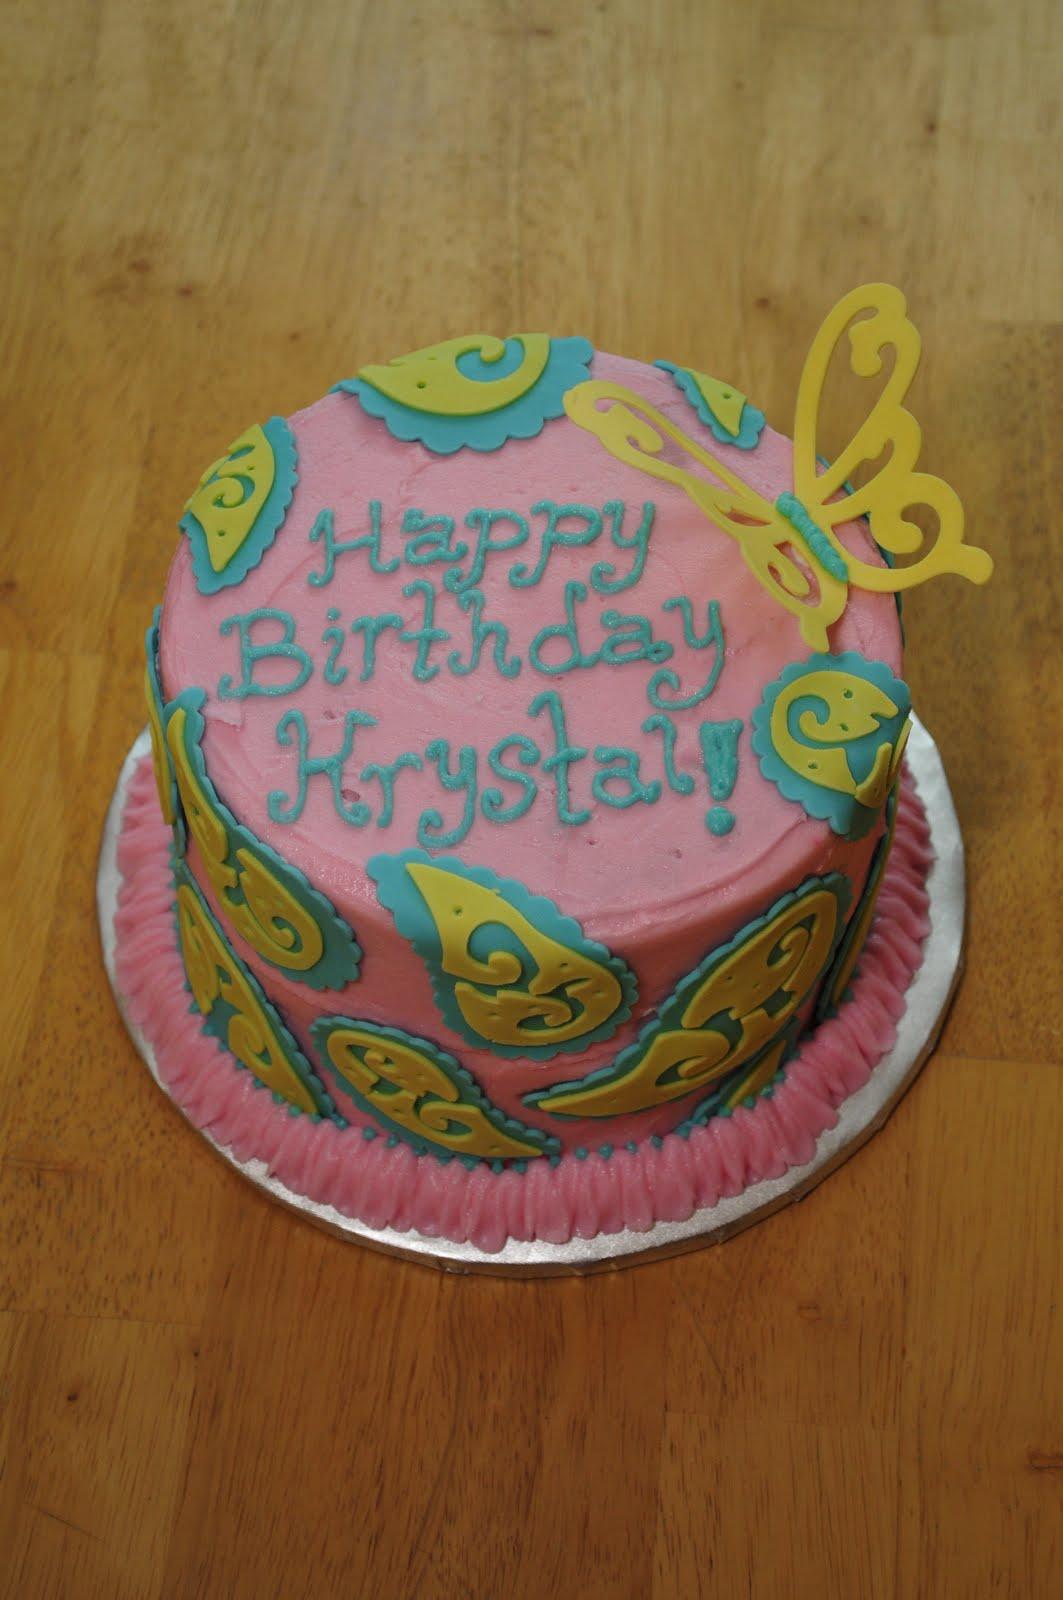 Lindsay S Custom Cakes Krystal S Birthday Cake